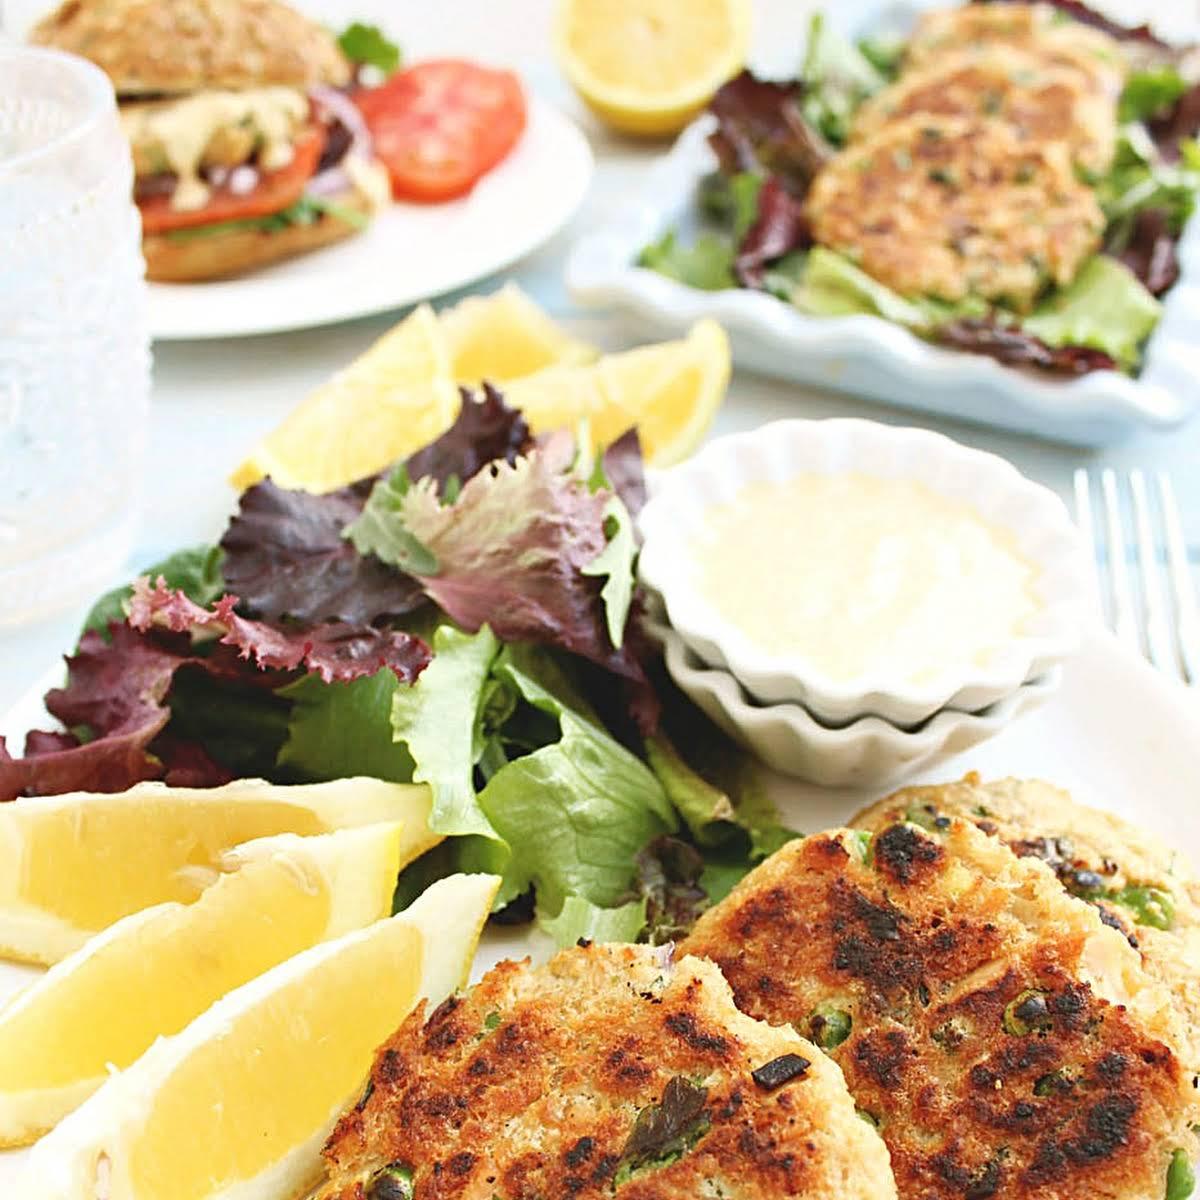 Salmon Tuna Burgers With Spicy Garlic Lemon Alioli